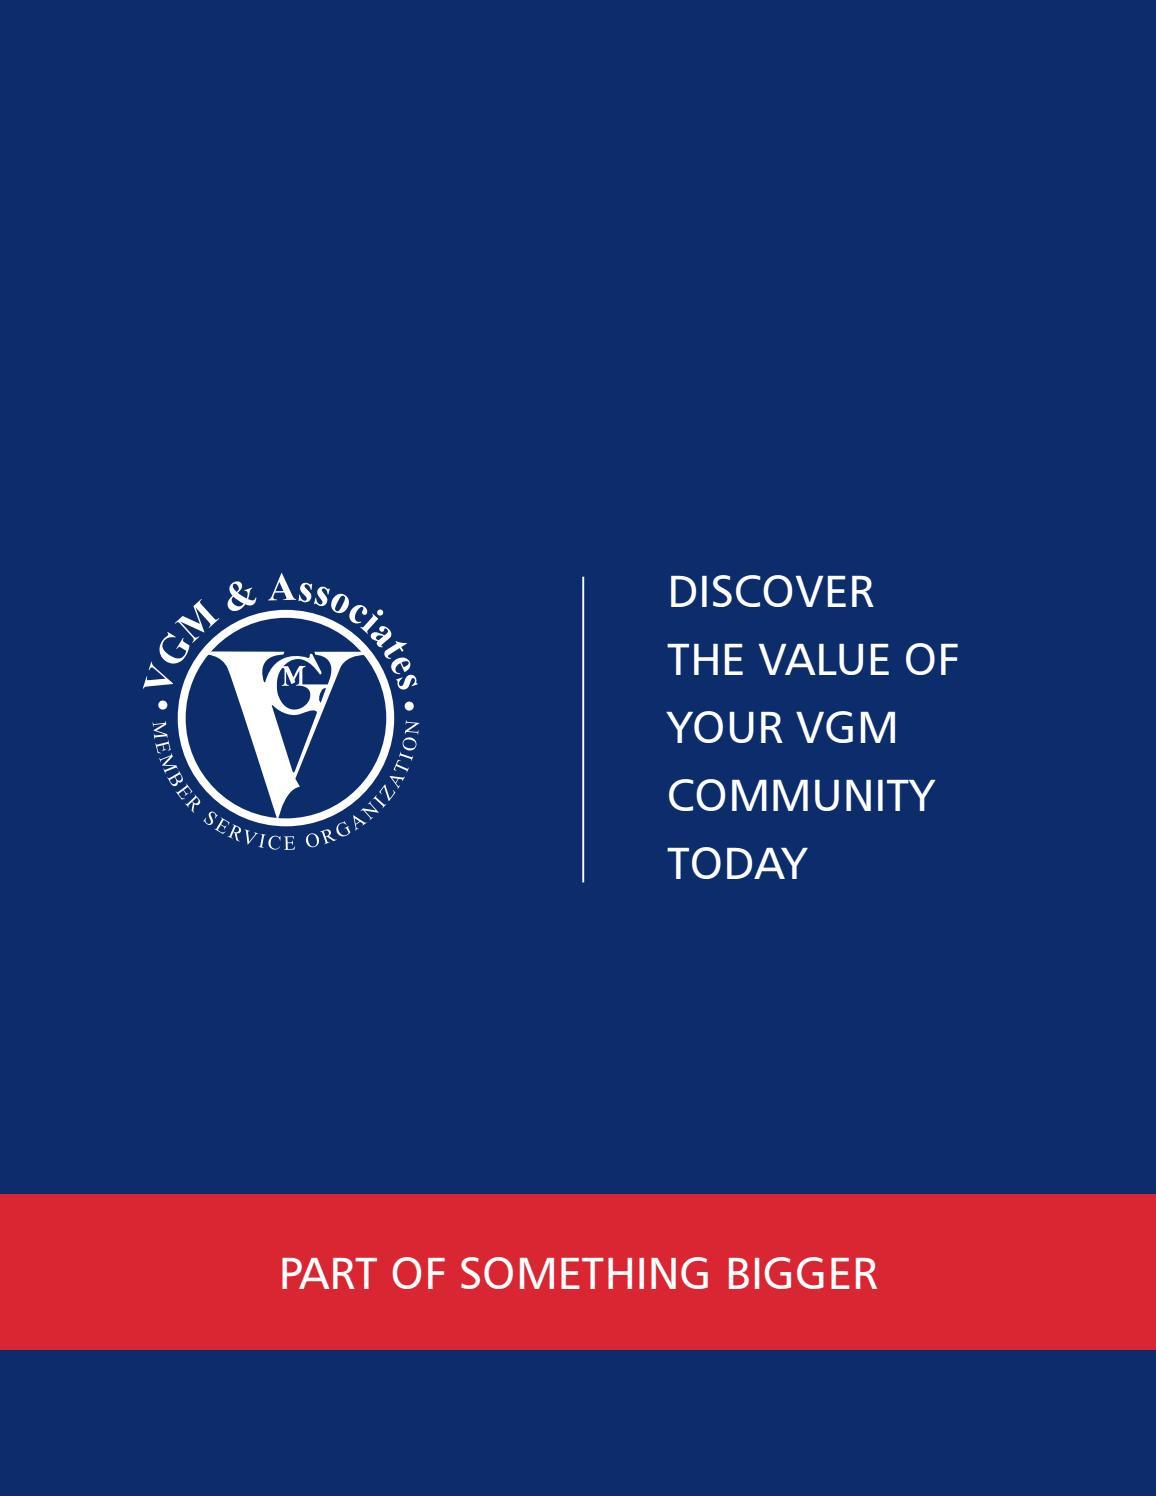 VGM & Associates Sales Folder by vgmassociates - issuu